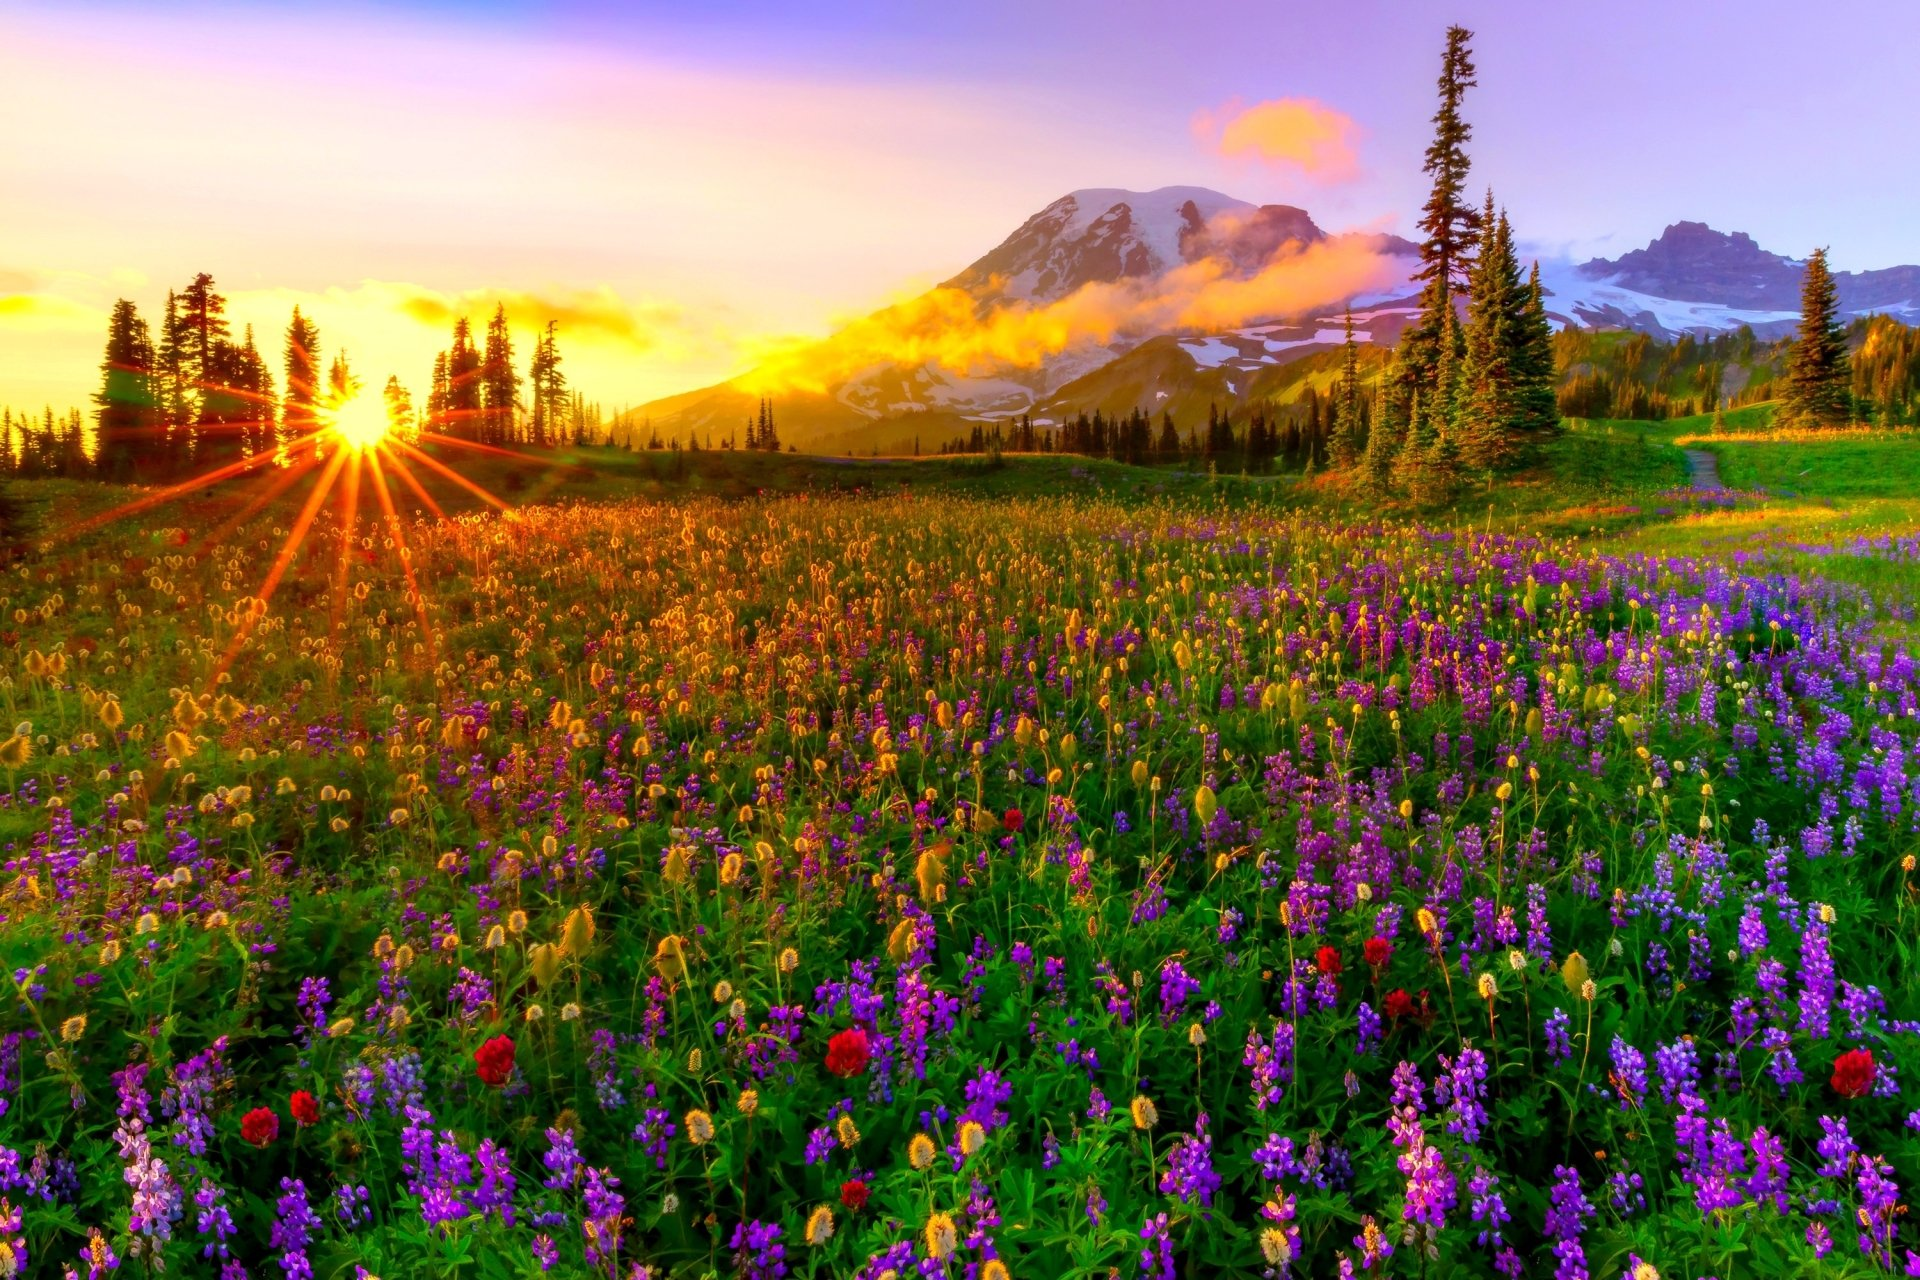 Earth - Spring  Earth Wildflower Landscape Mountain Flower Meadow Field Colorful Sunset Wallpaper